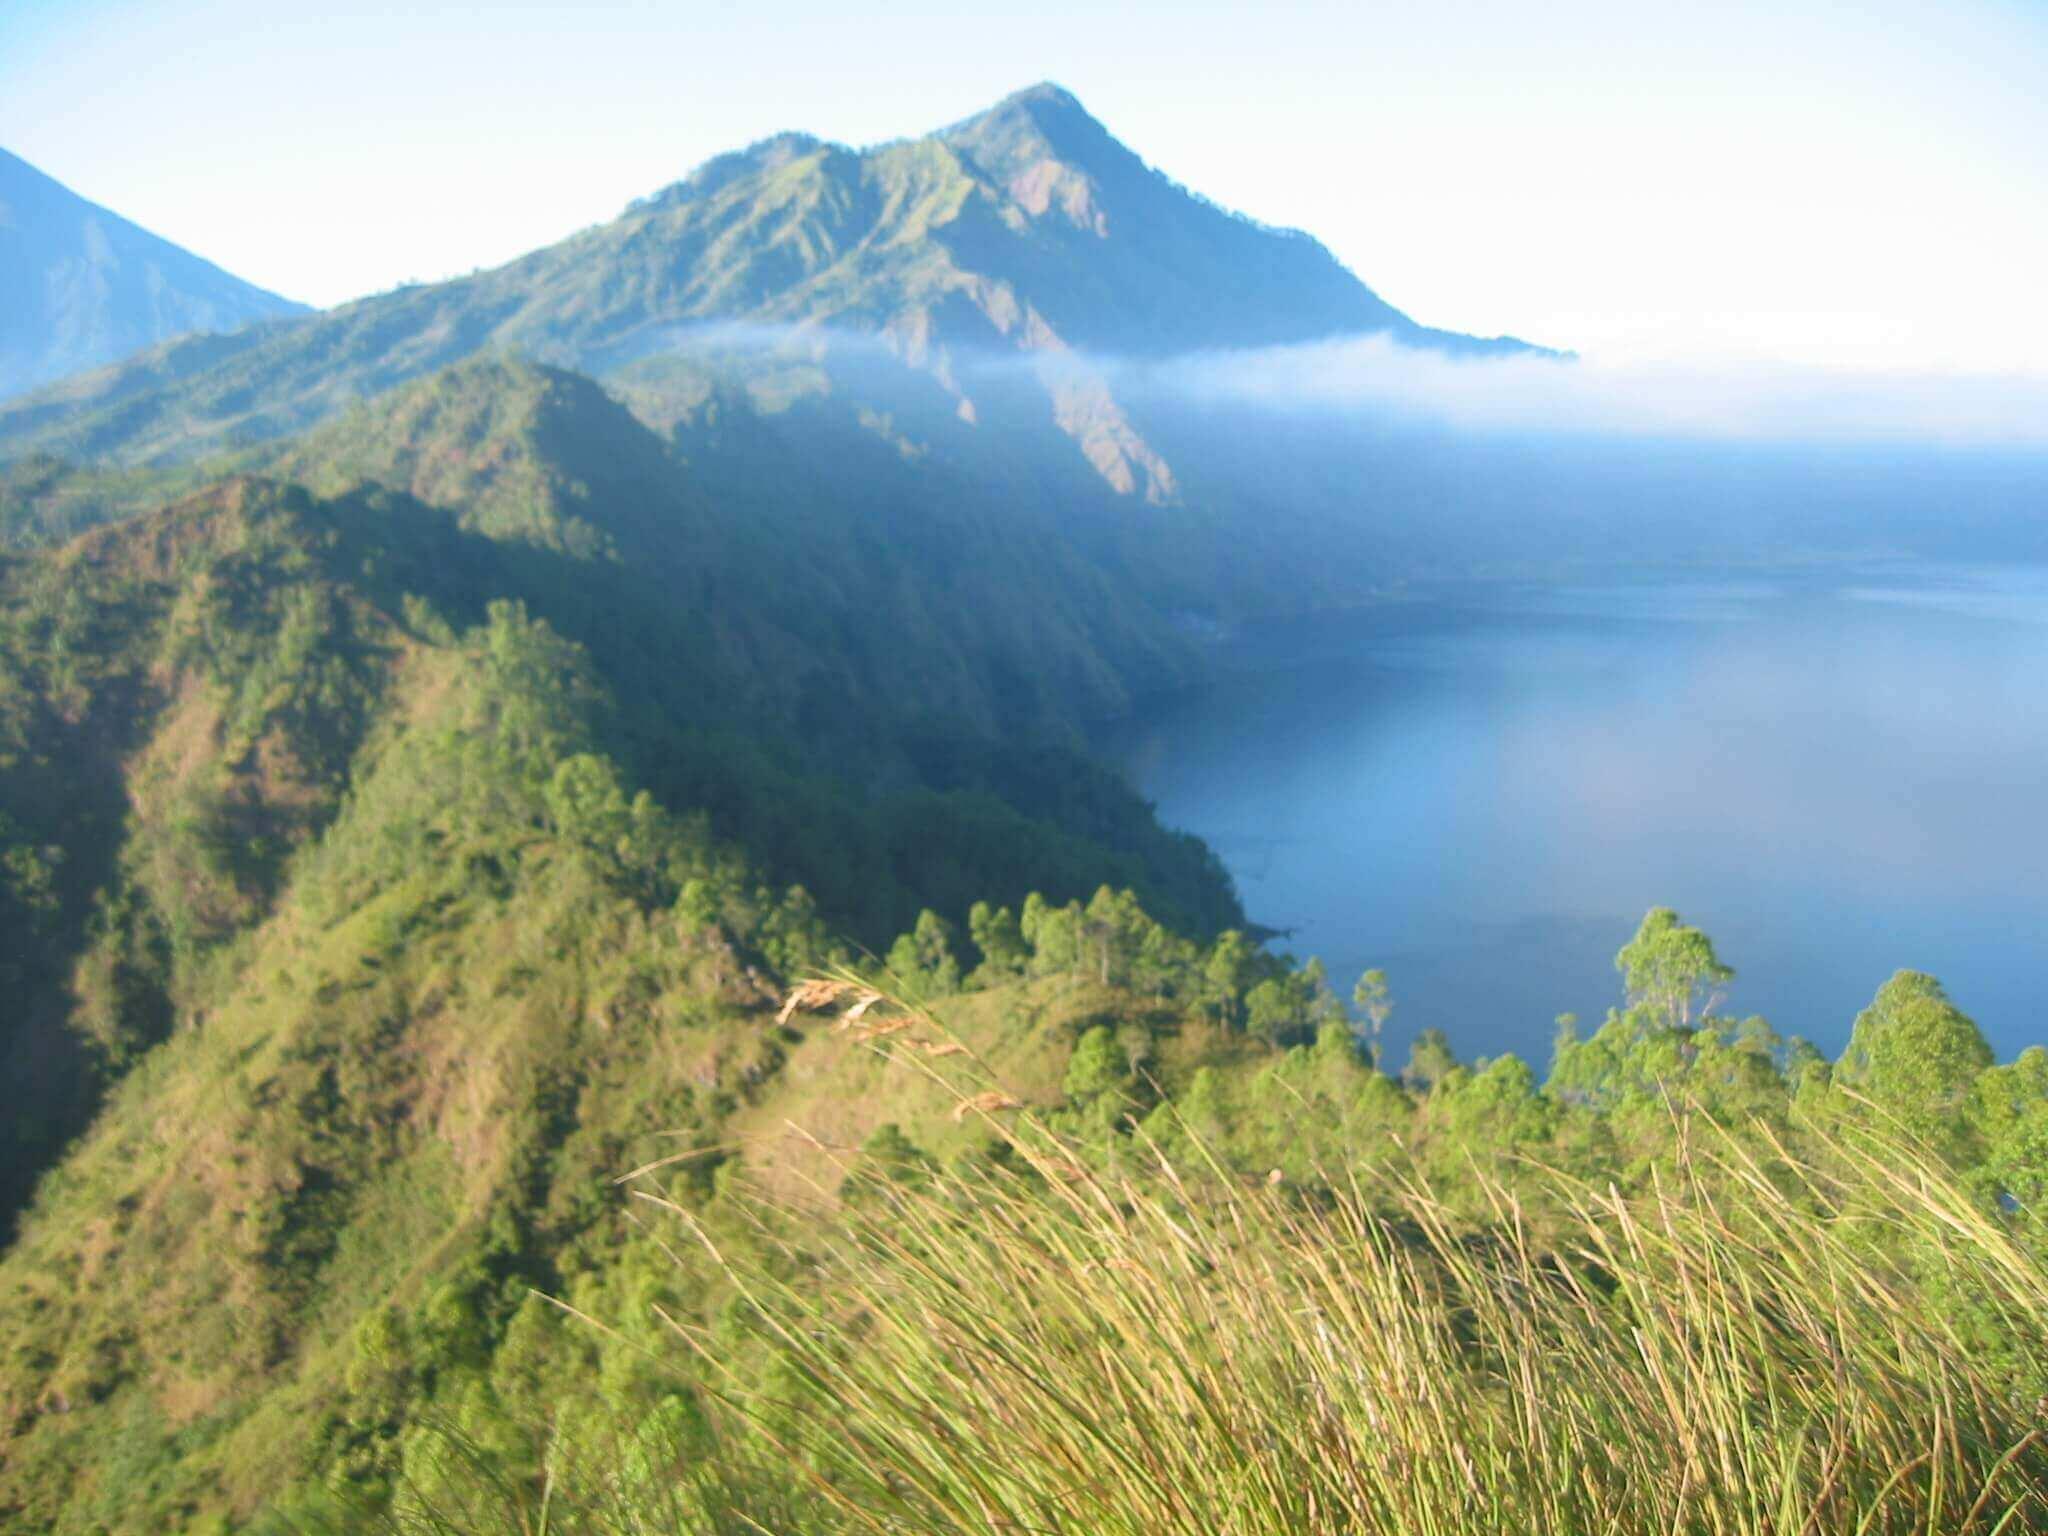 Bali Sunrise Trekking & Tours